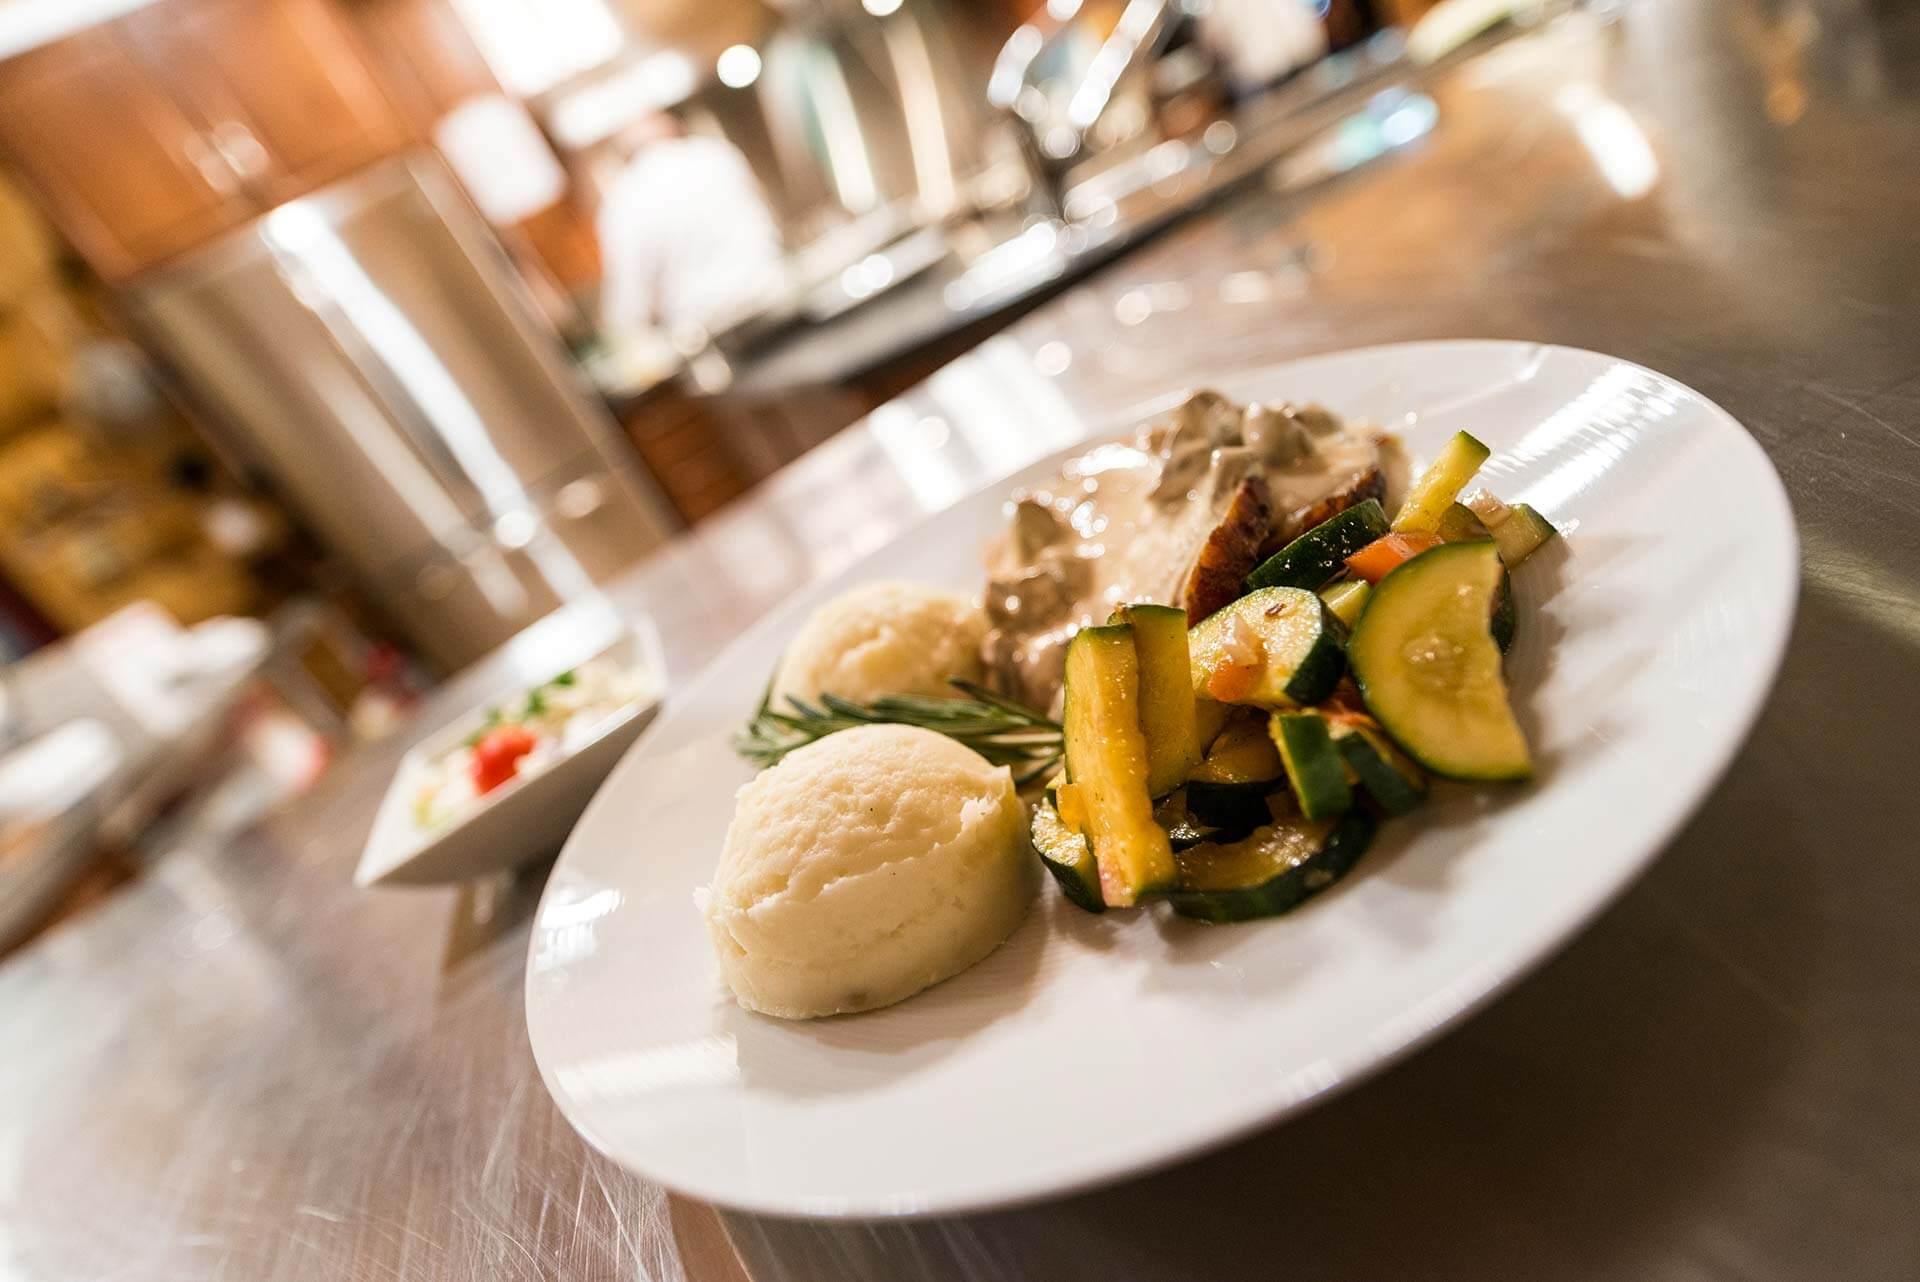 North/Central Interior fishing lodge all inclusive lodge meals in BC